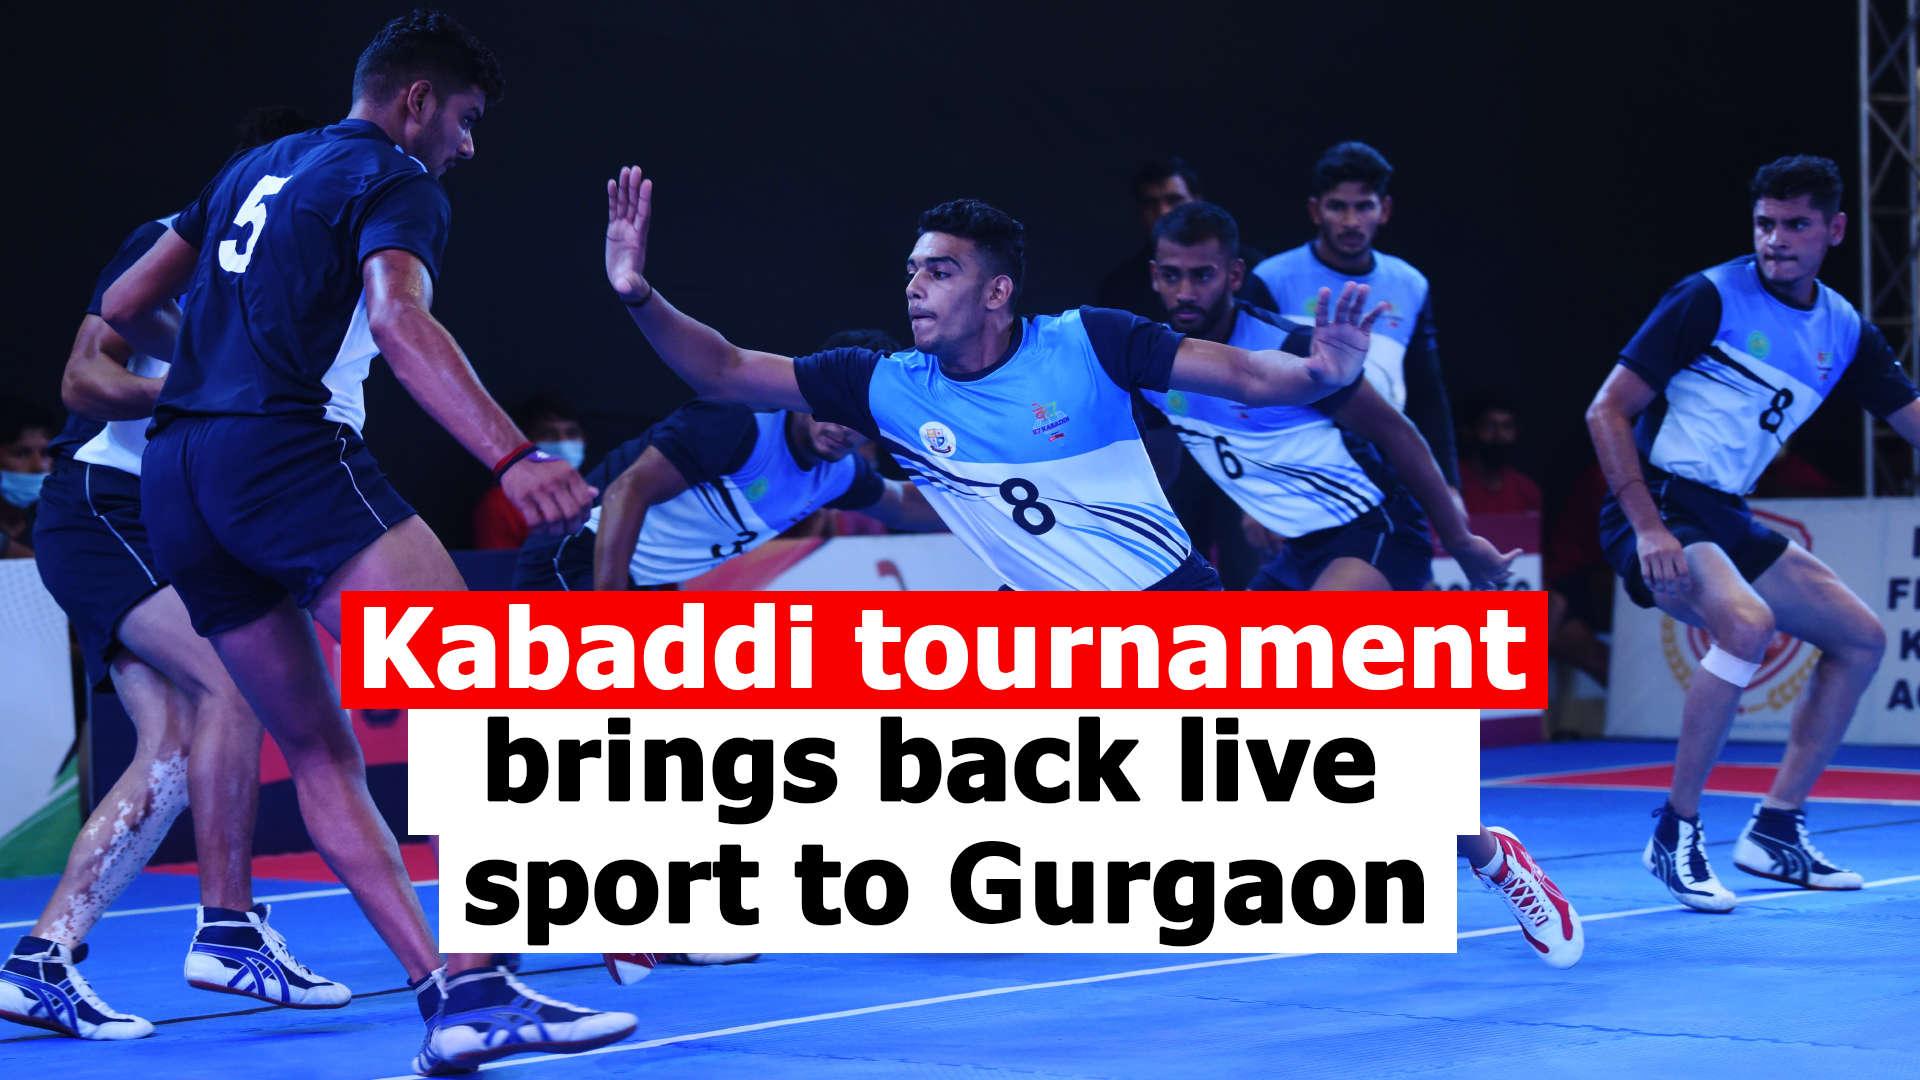 kabaddi-tournament-brings-back-live-sport-to-gurgaon